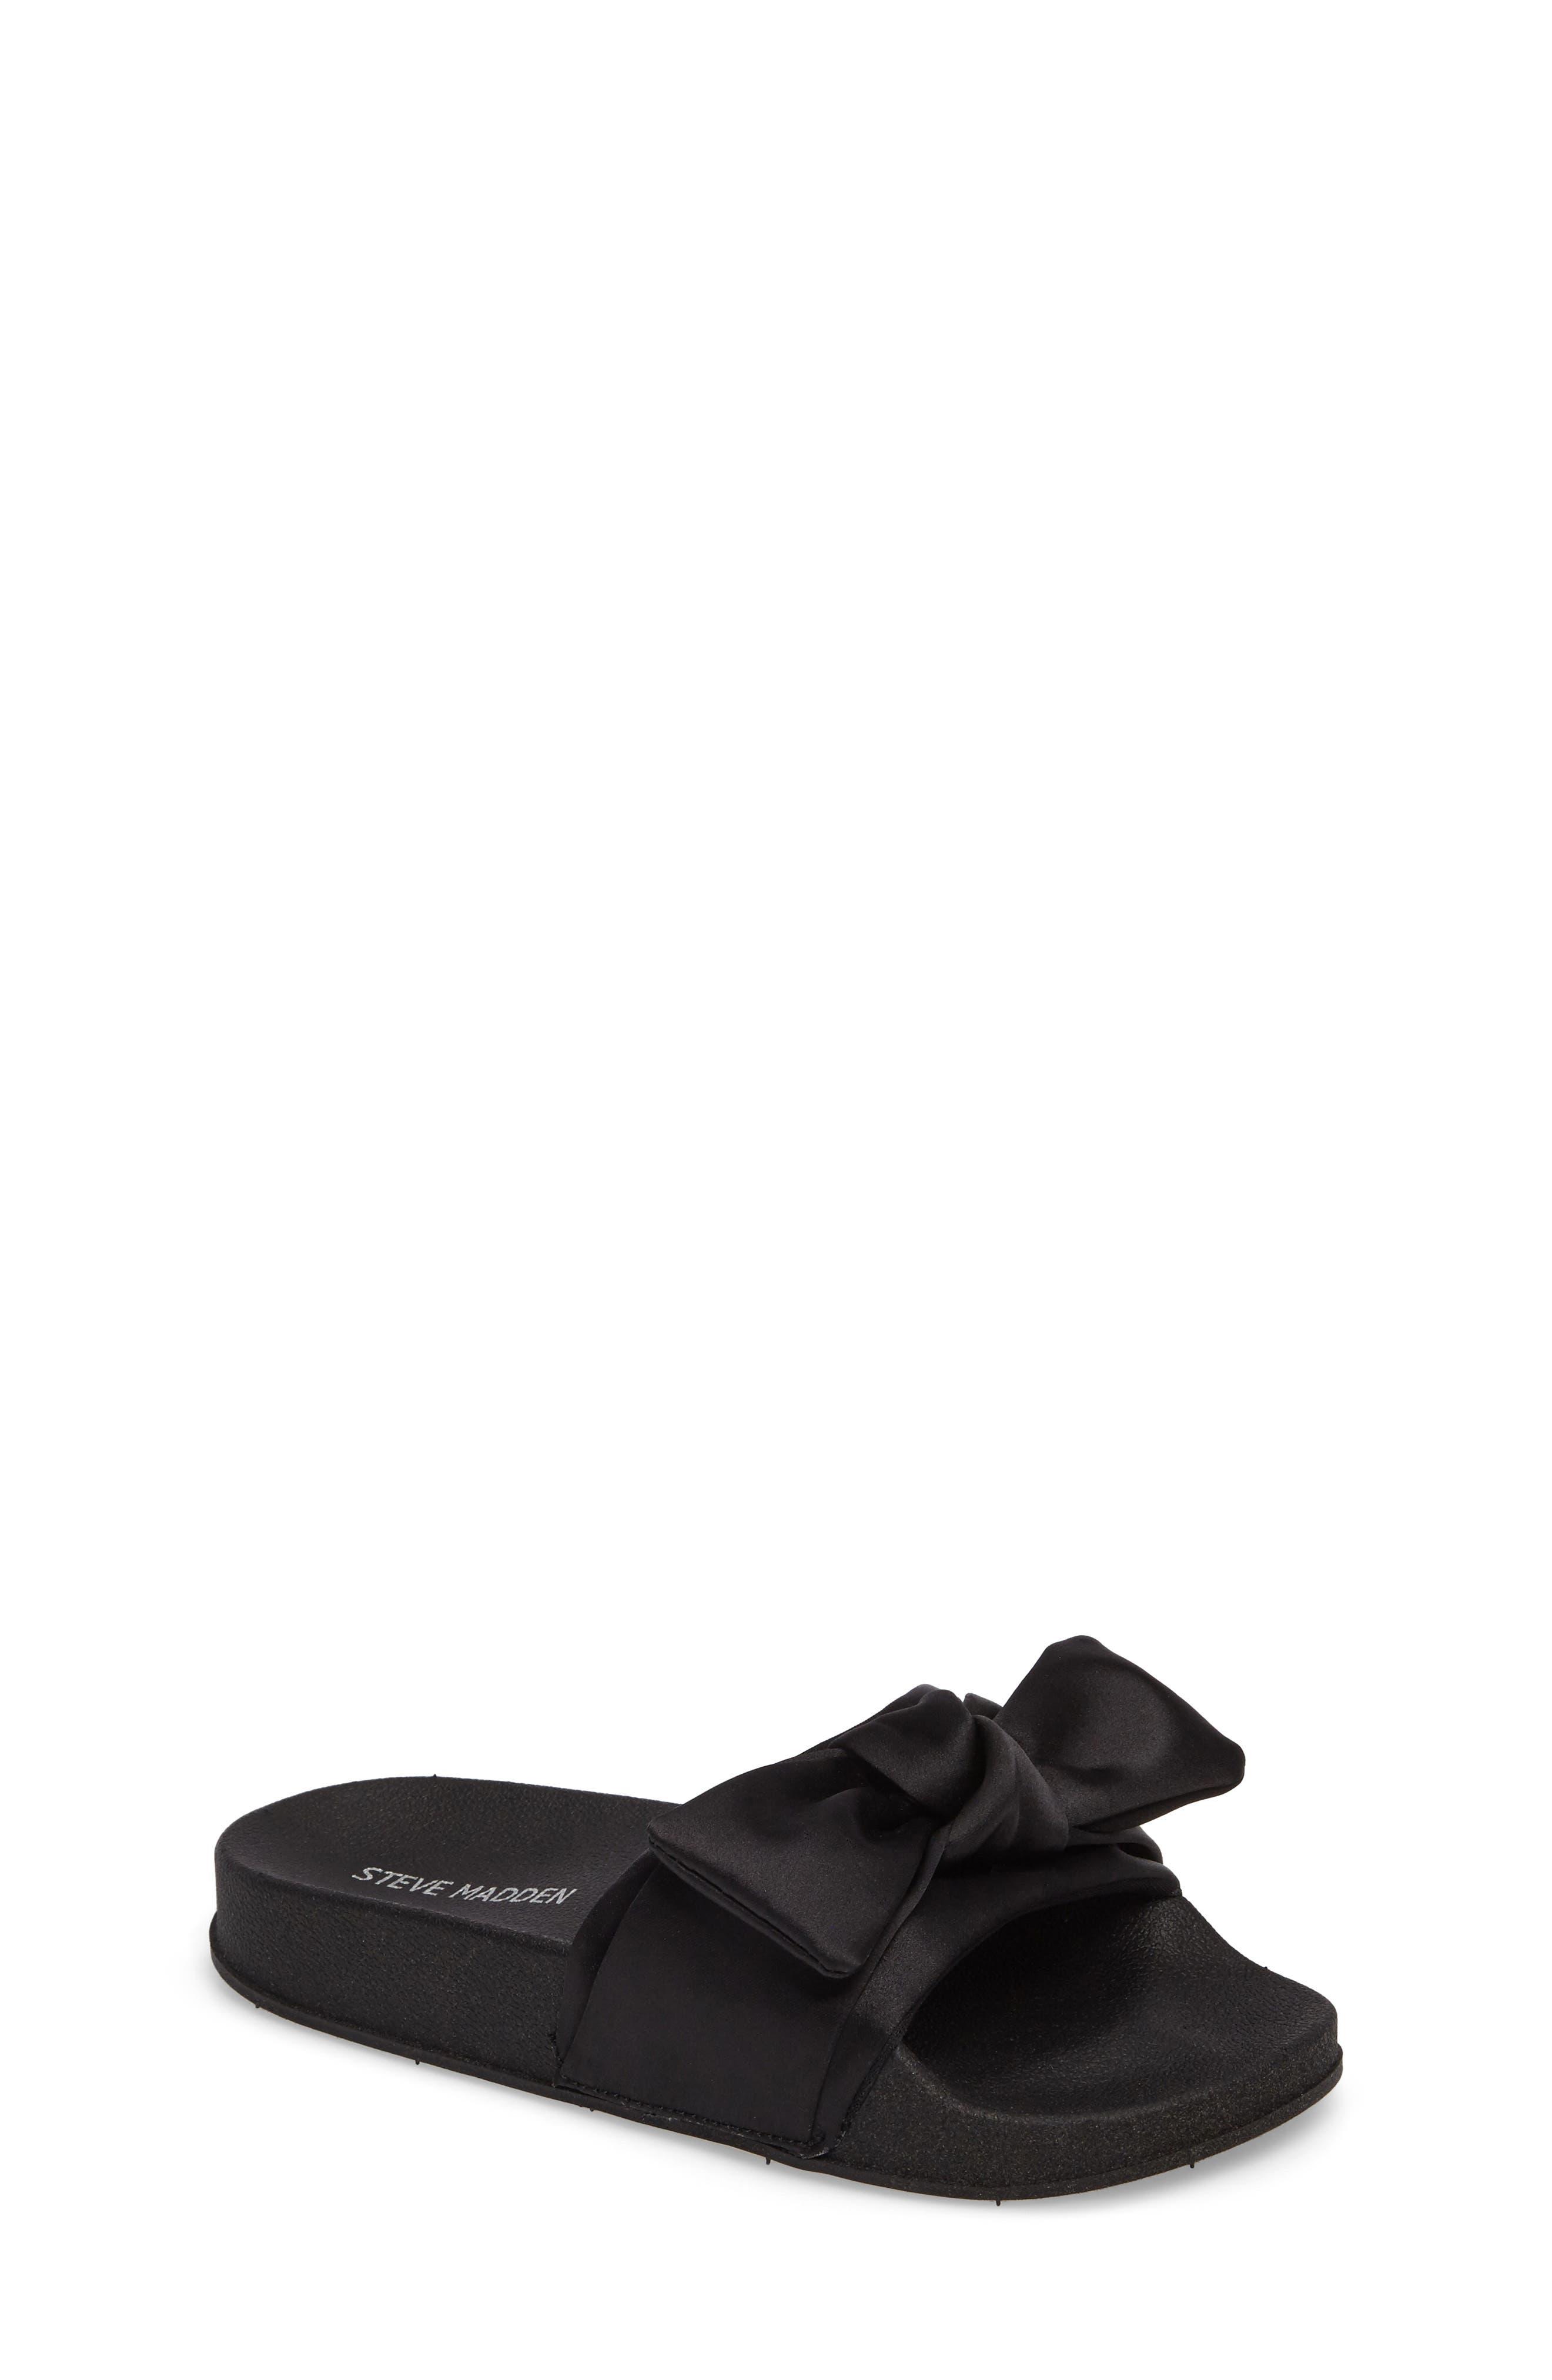 JSilky Slide Sandal,                         Main,                         color, 003